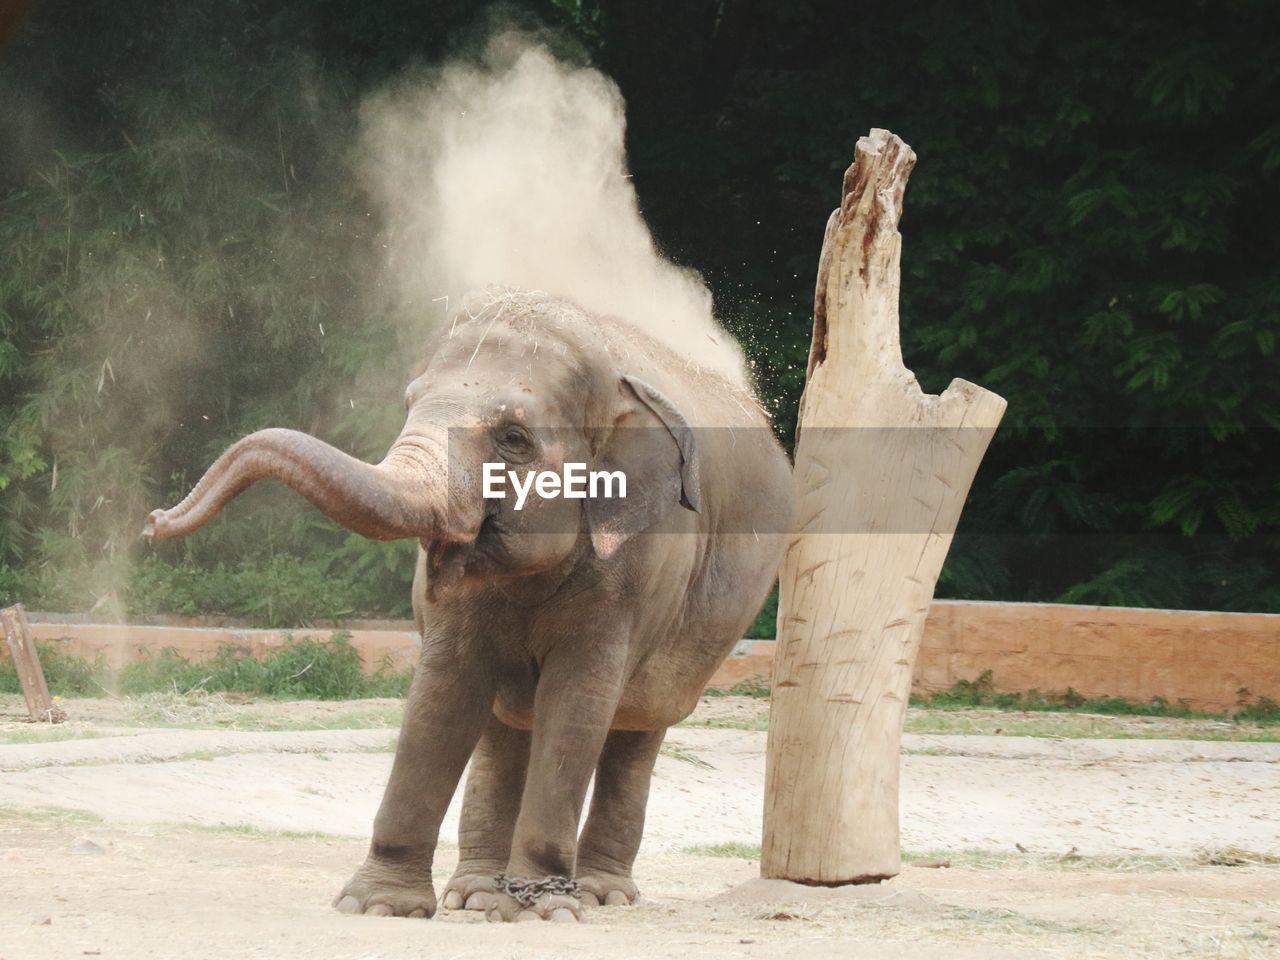 Baby elephant, sand bath